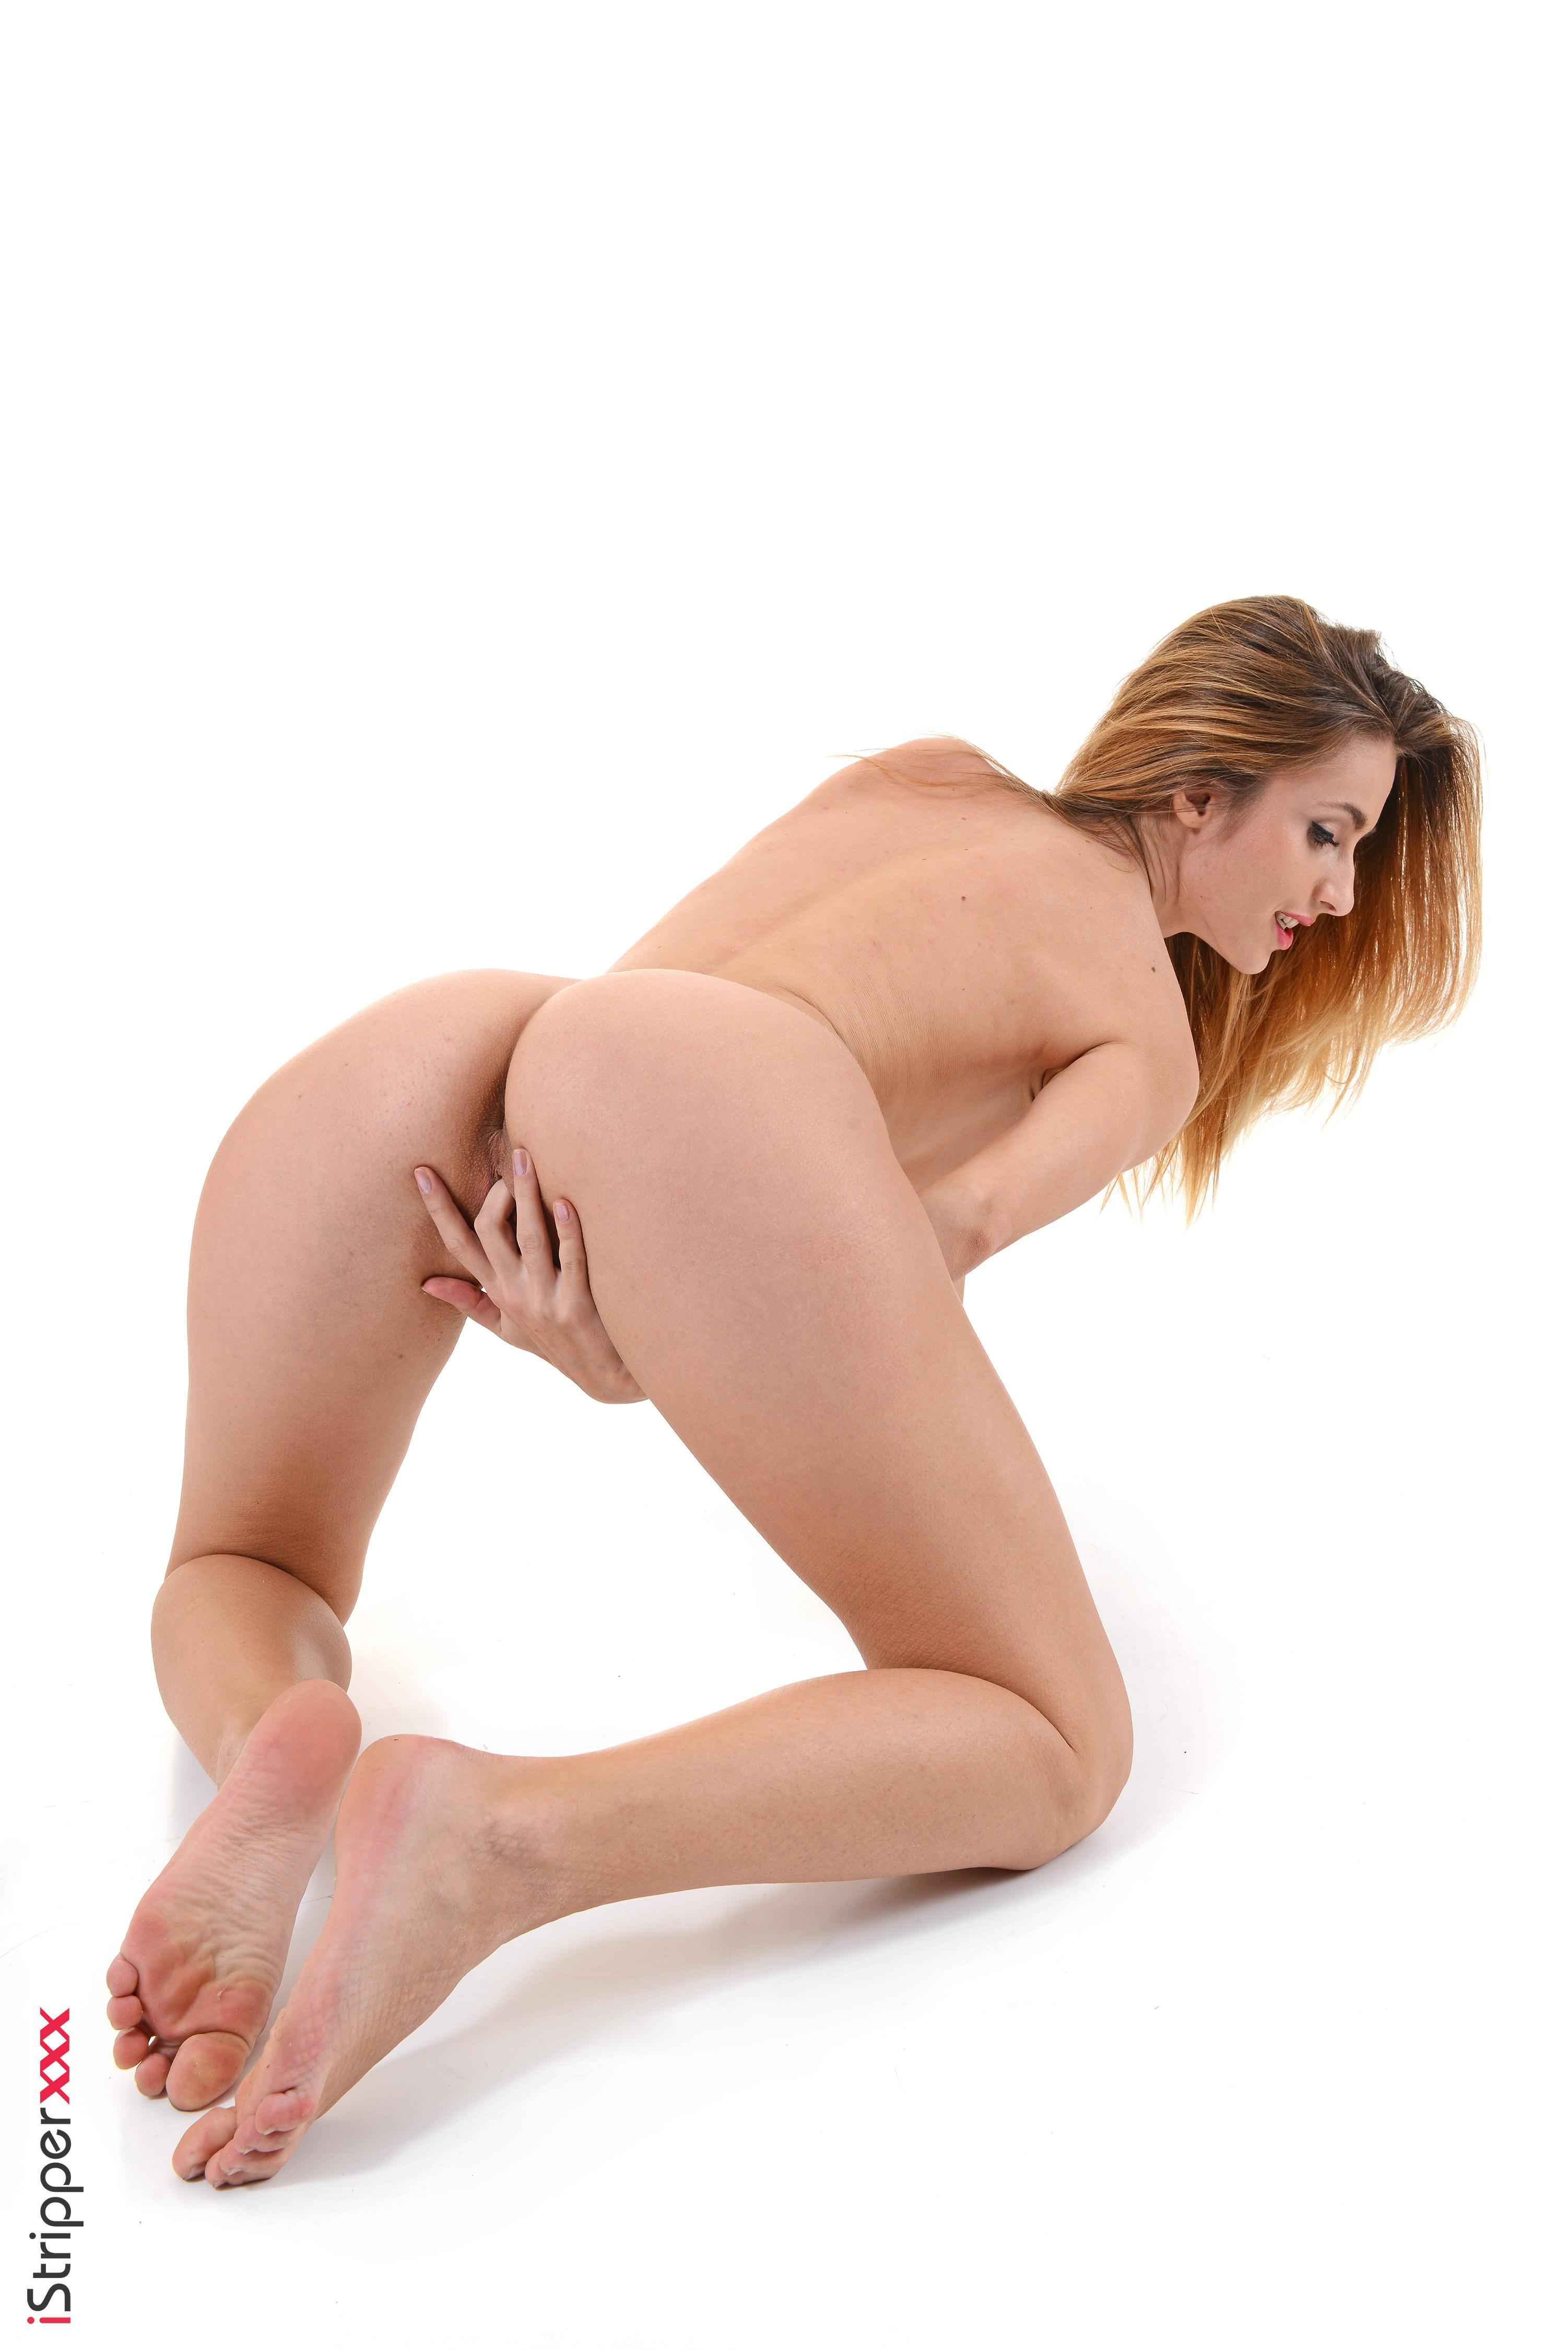 bikini girls stripping